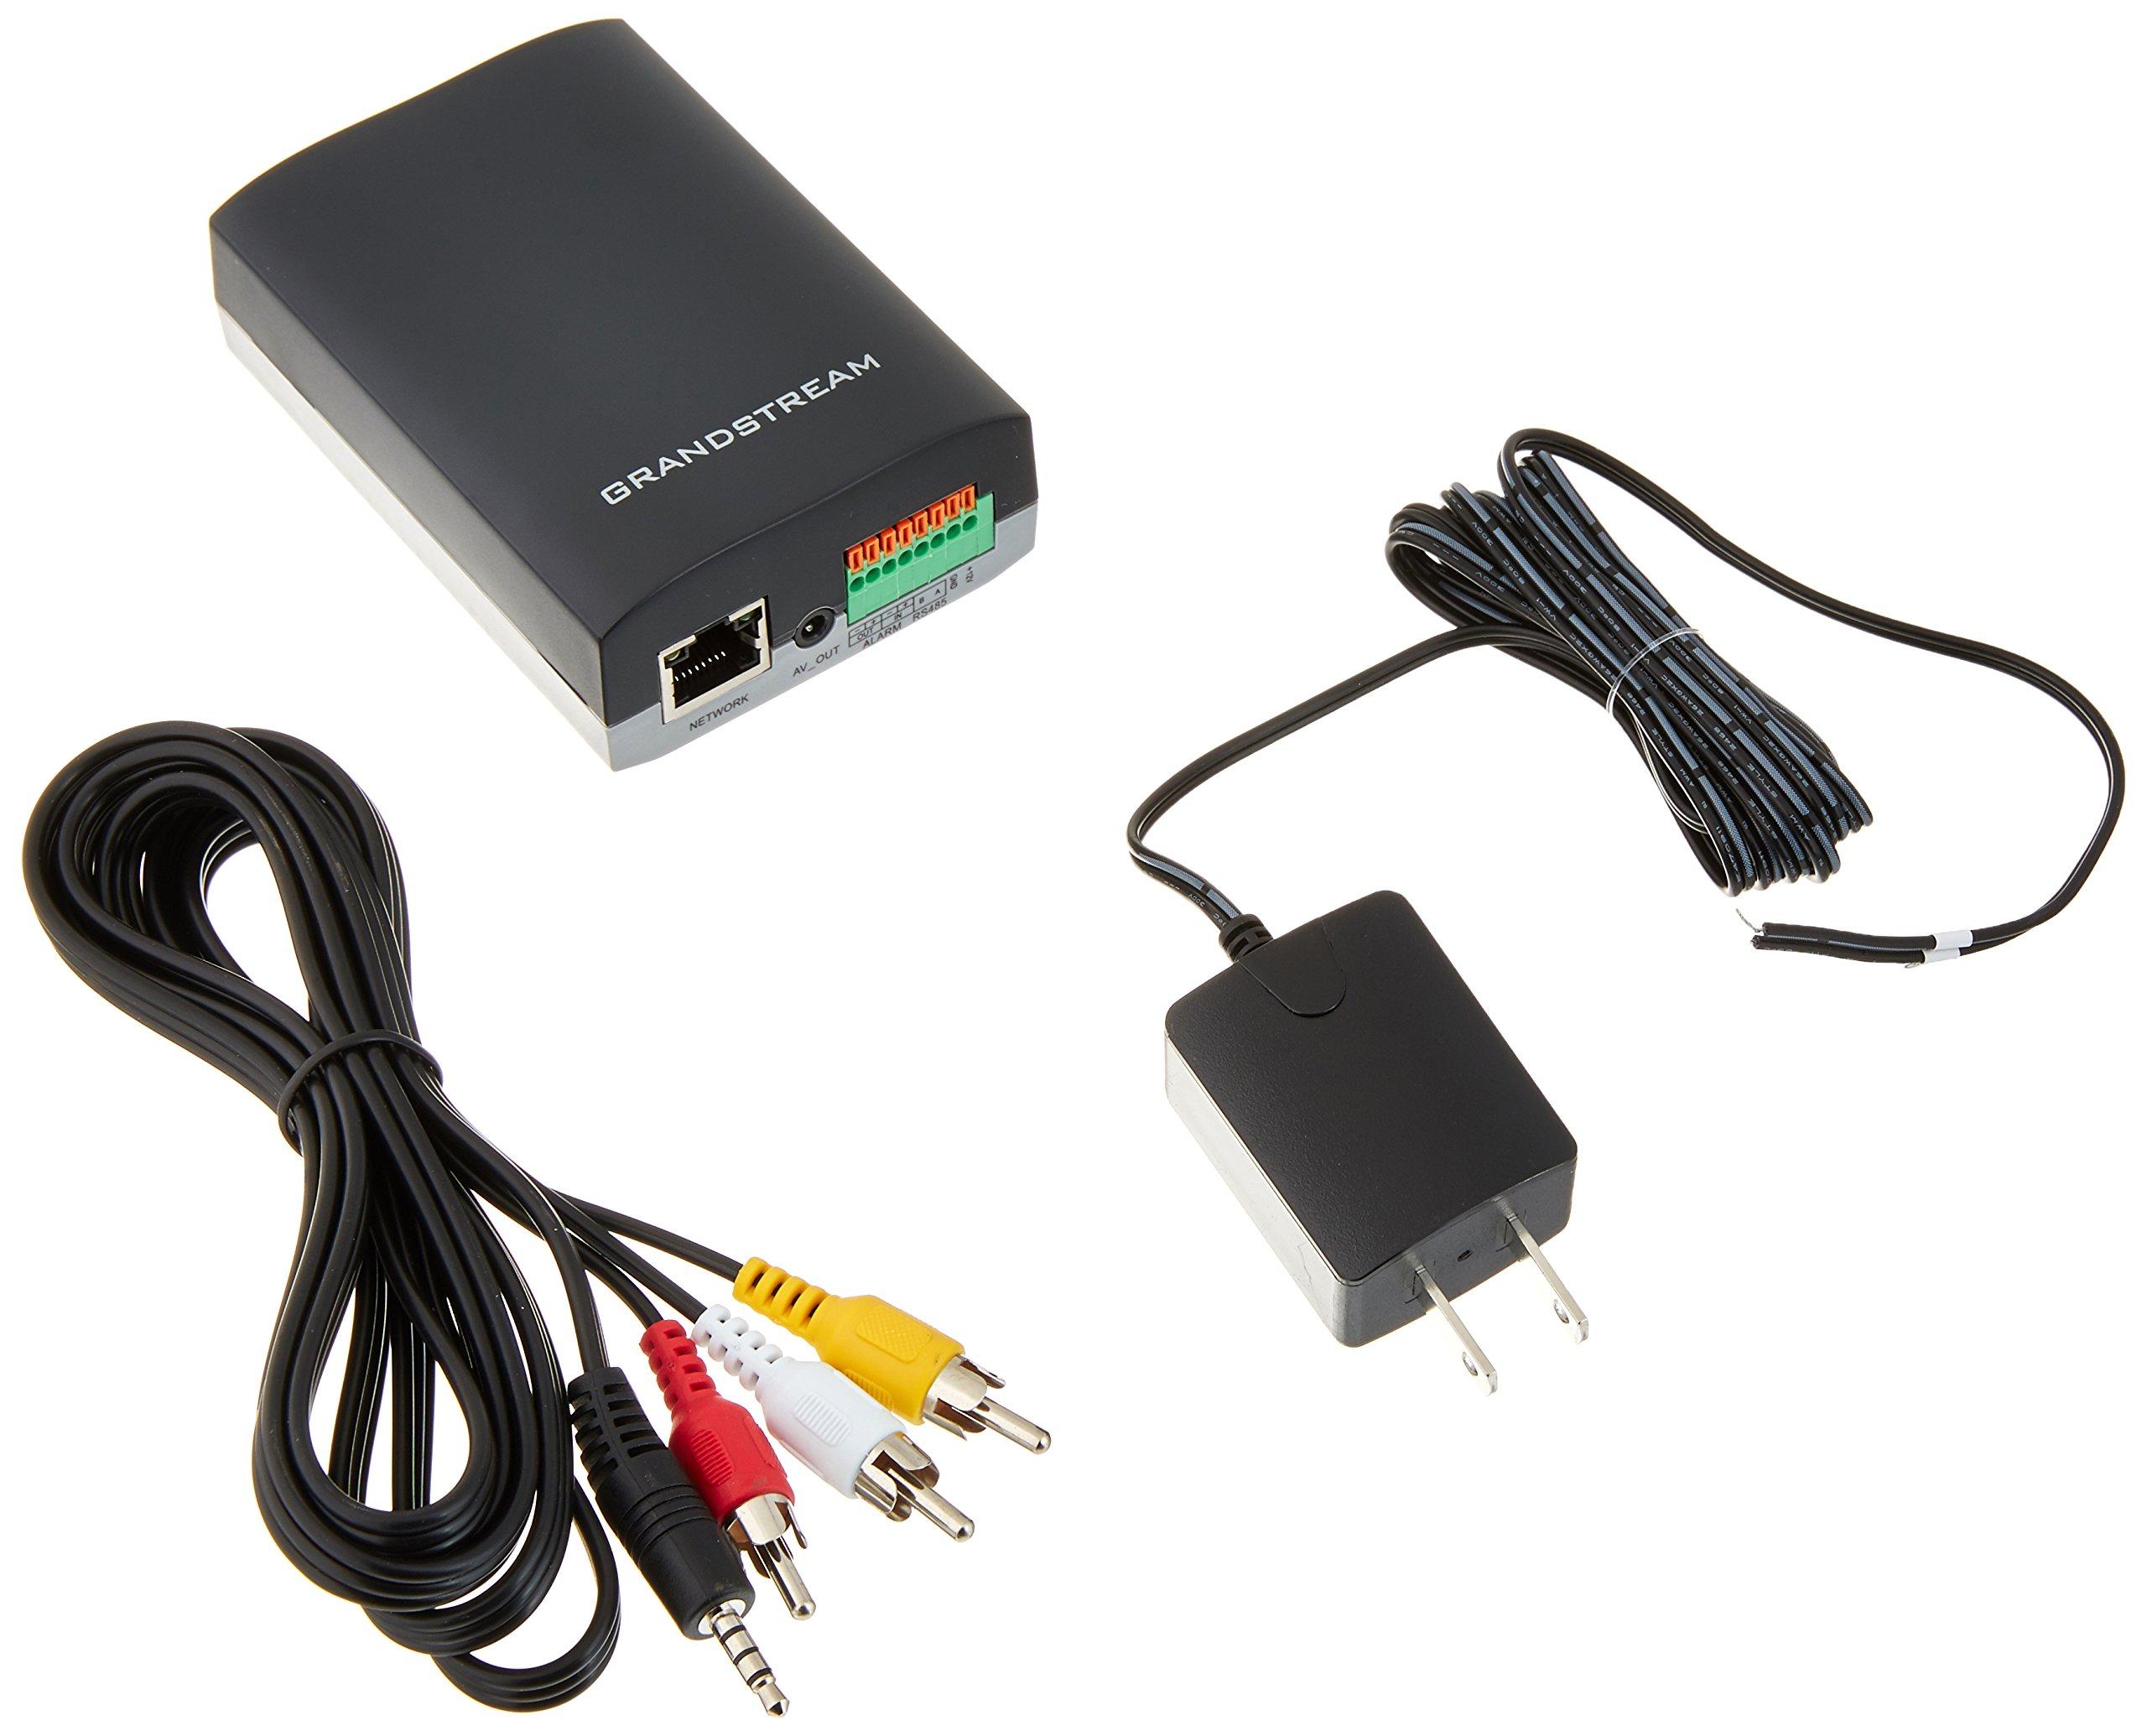 Grandstream GS-GXV3500 IP Video Encoder/Decoder by Grandstream